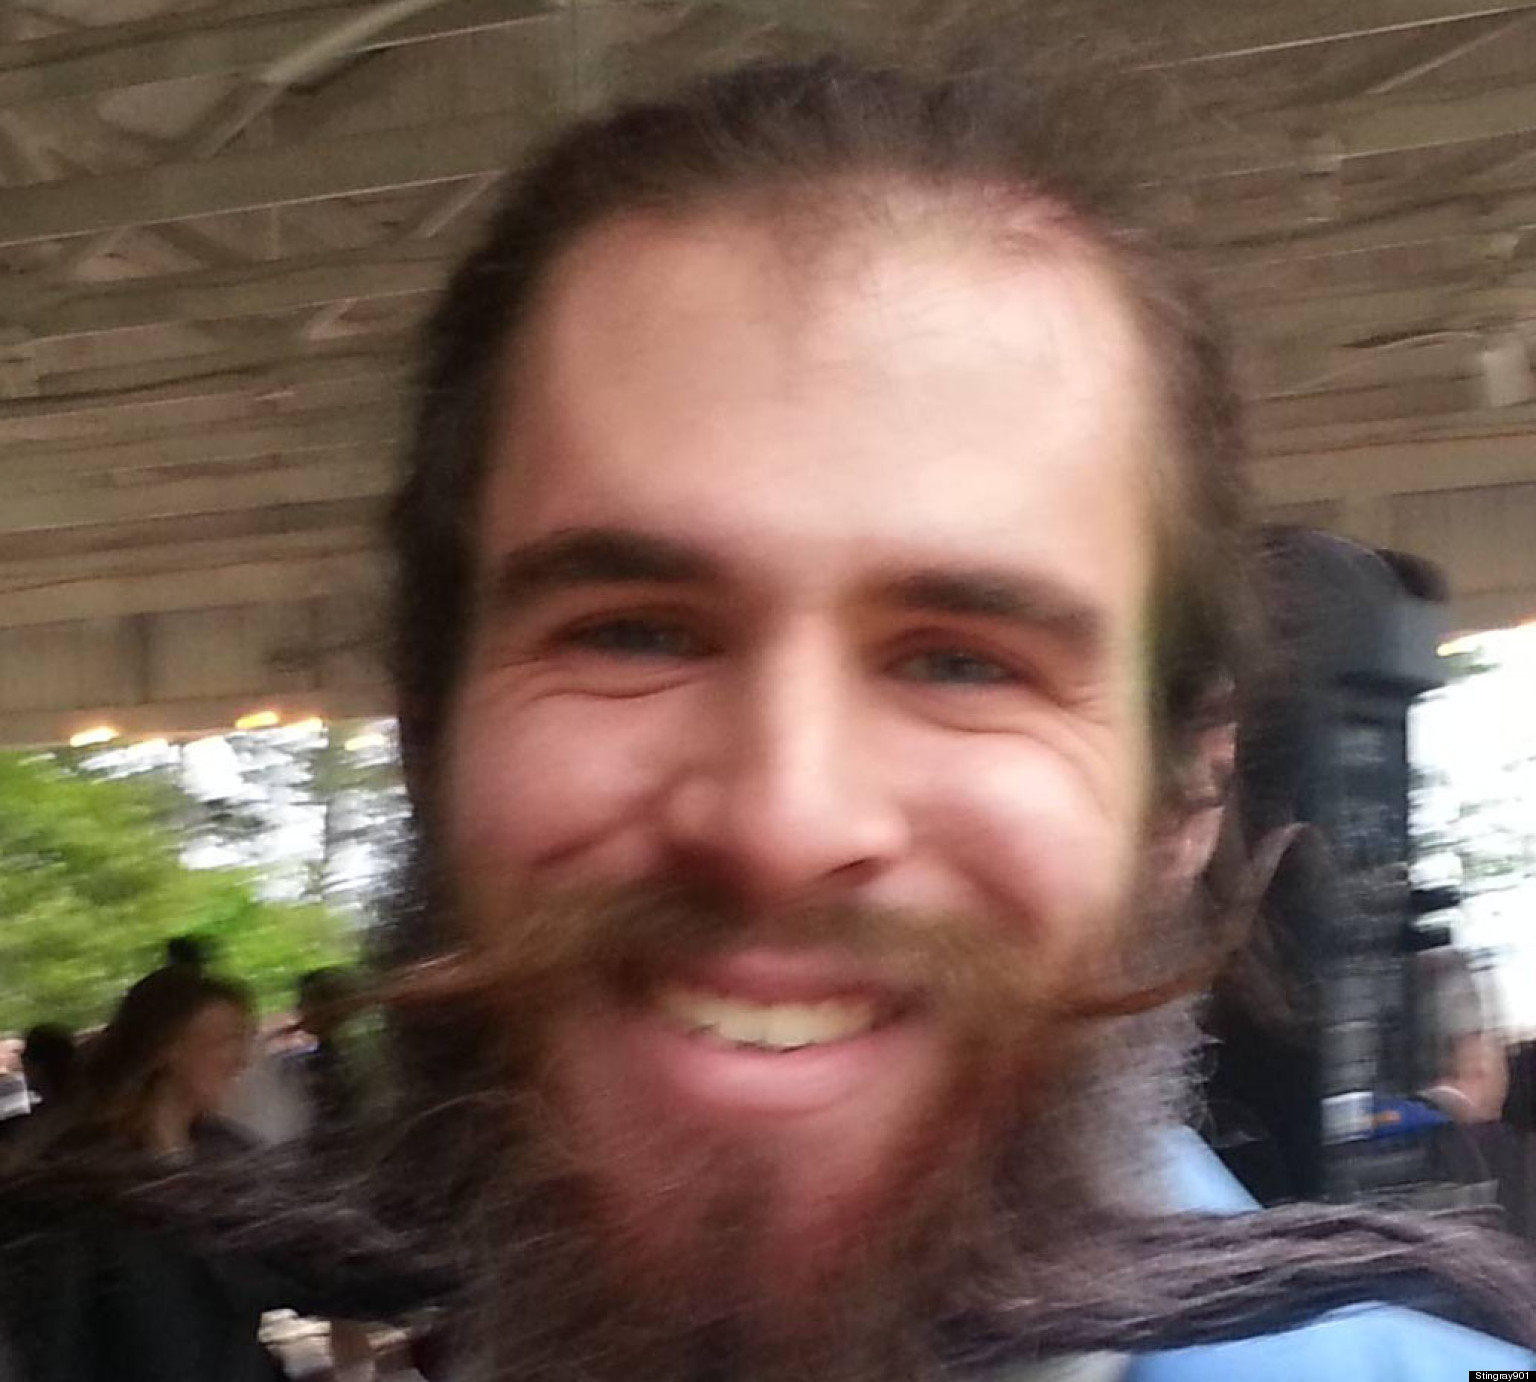 Justin timberlake facial hair styles-8726